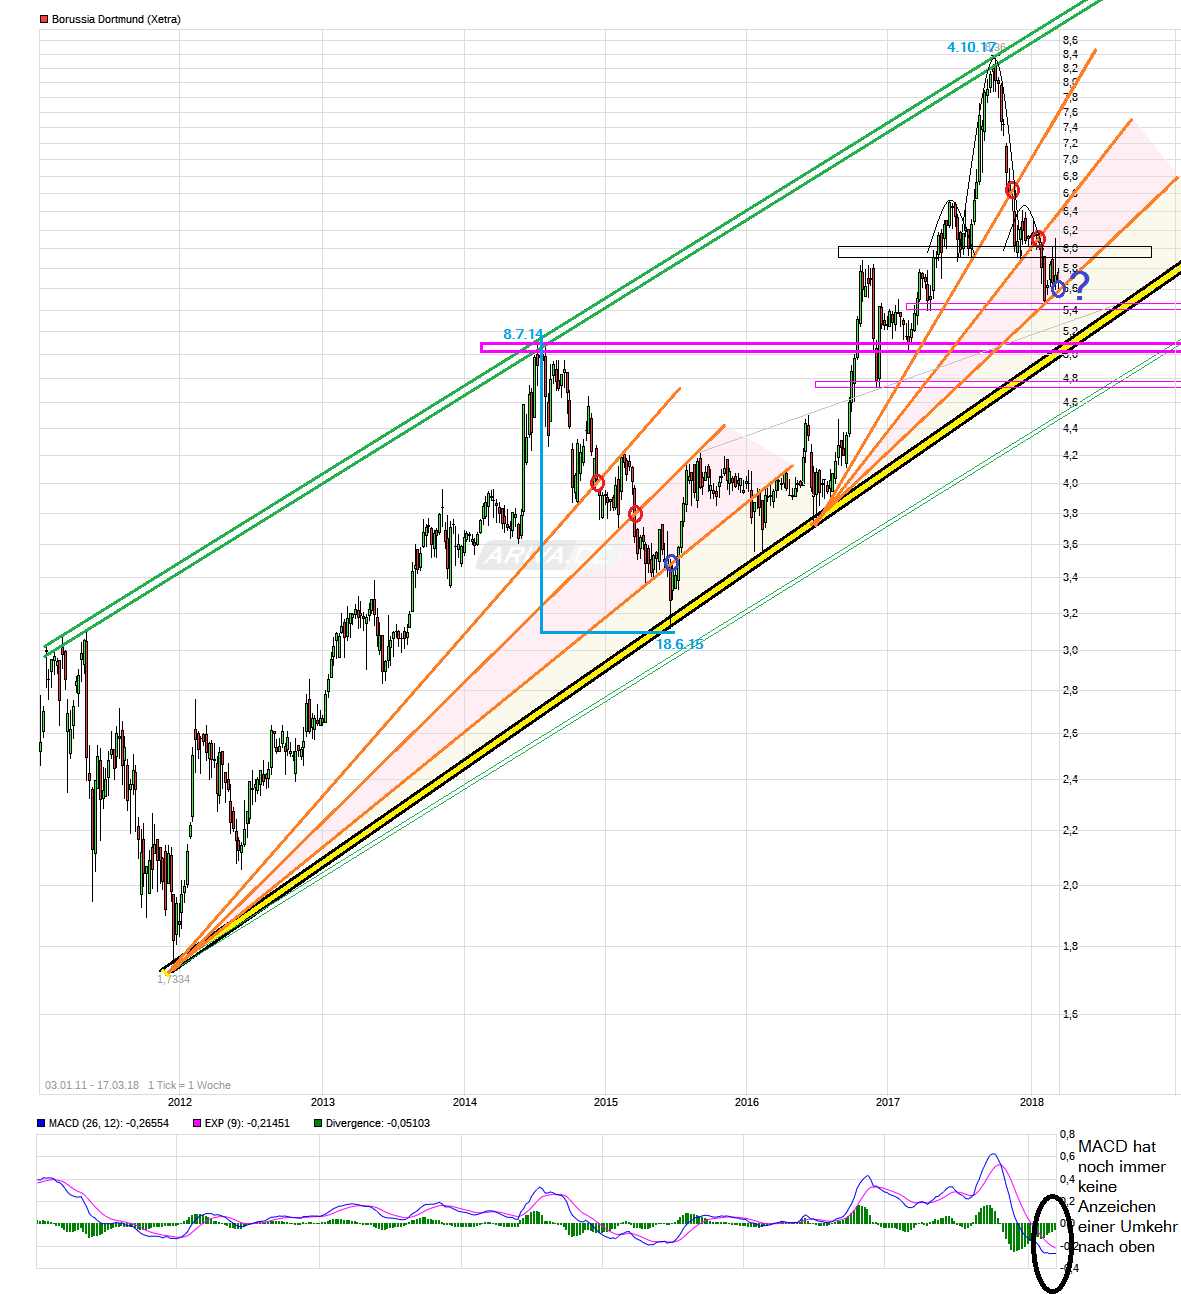 chart__borussia__dortmund.png